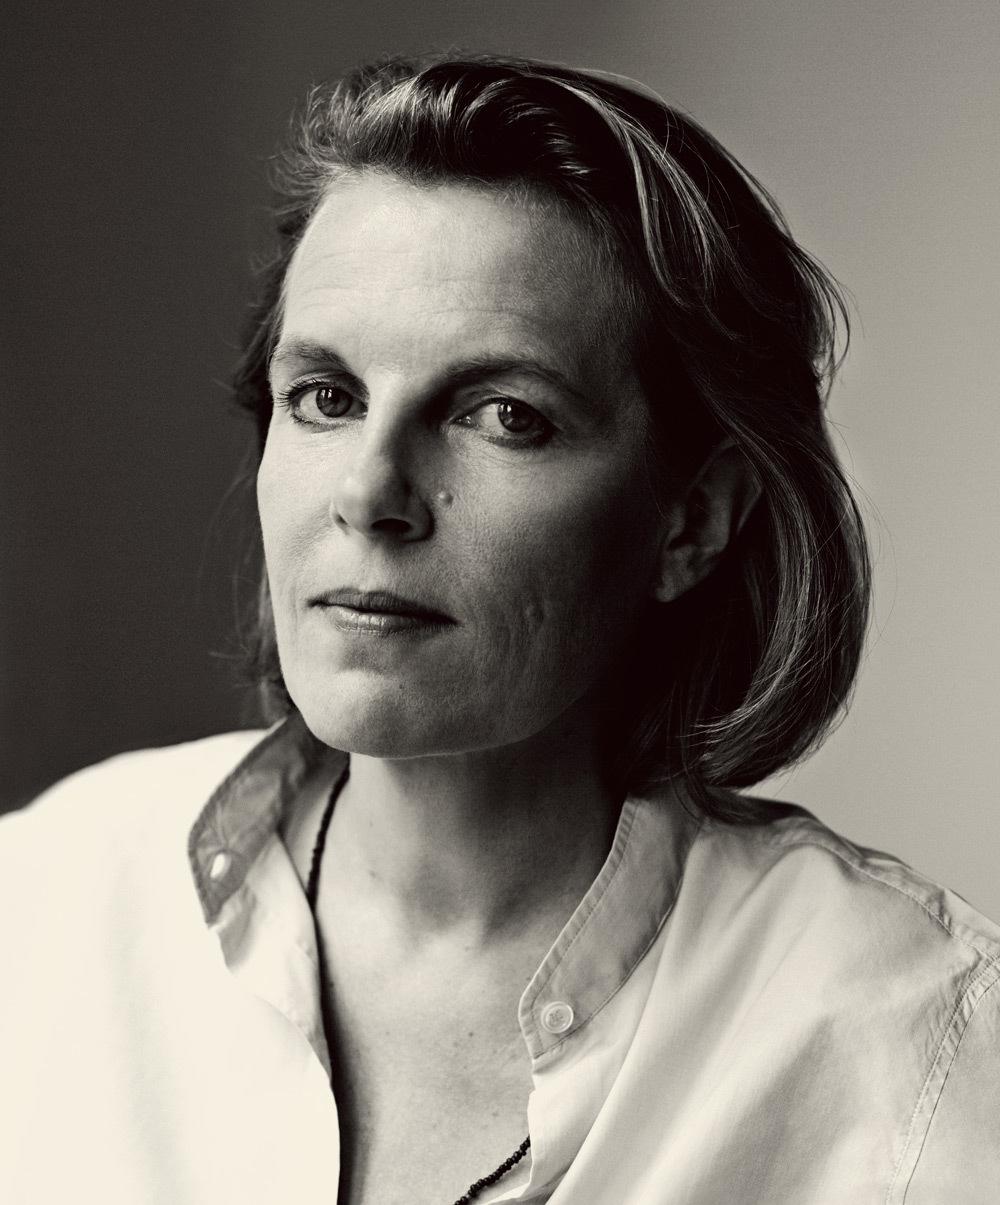 Annabelle Selldorf, photo by Annemieke van Drimmelen, image via thegentlewoman.co.uk